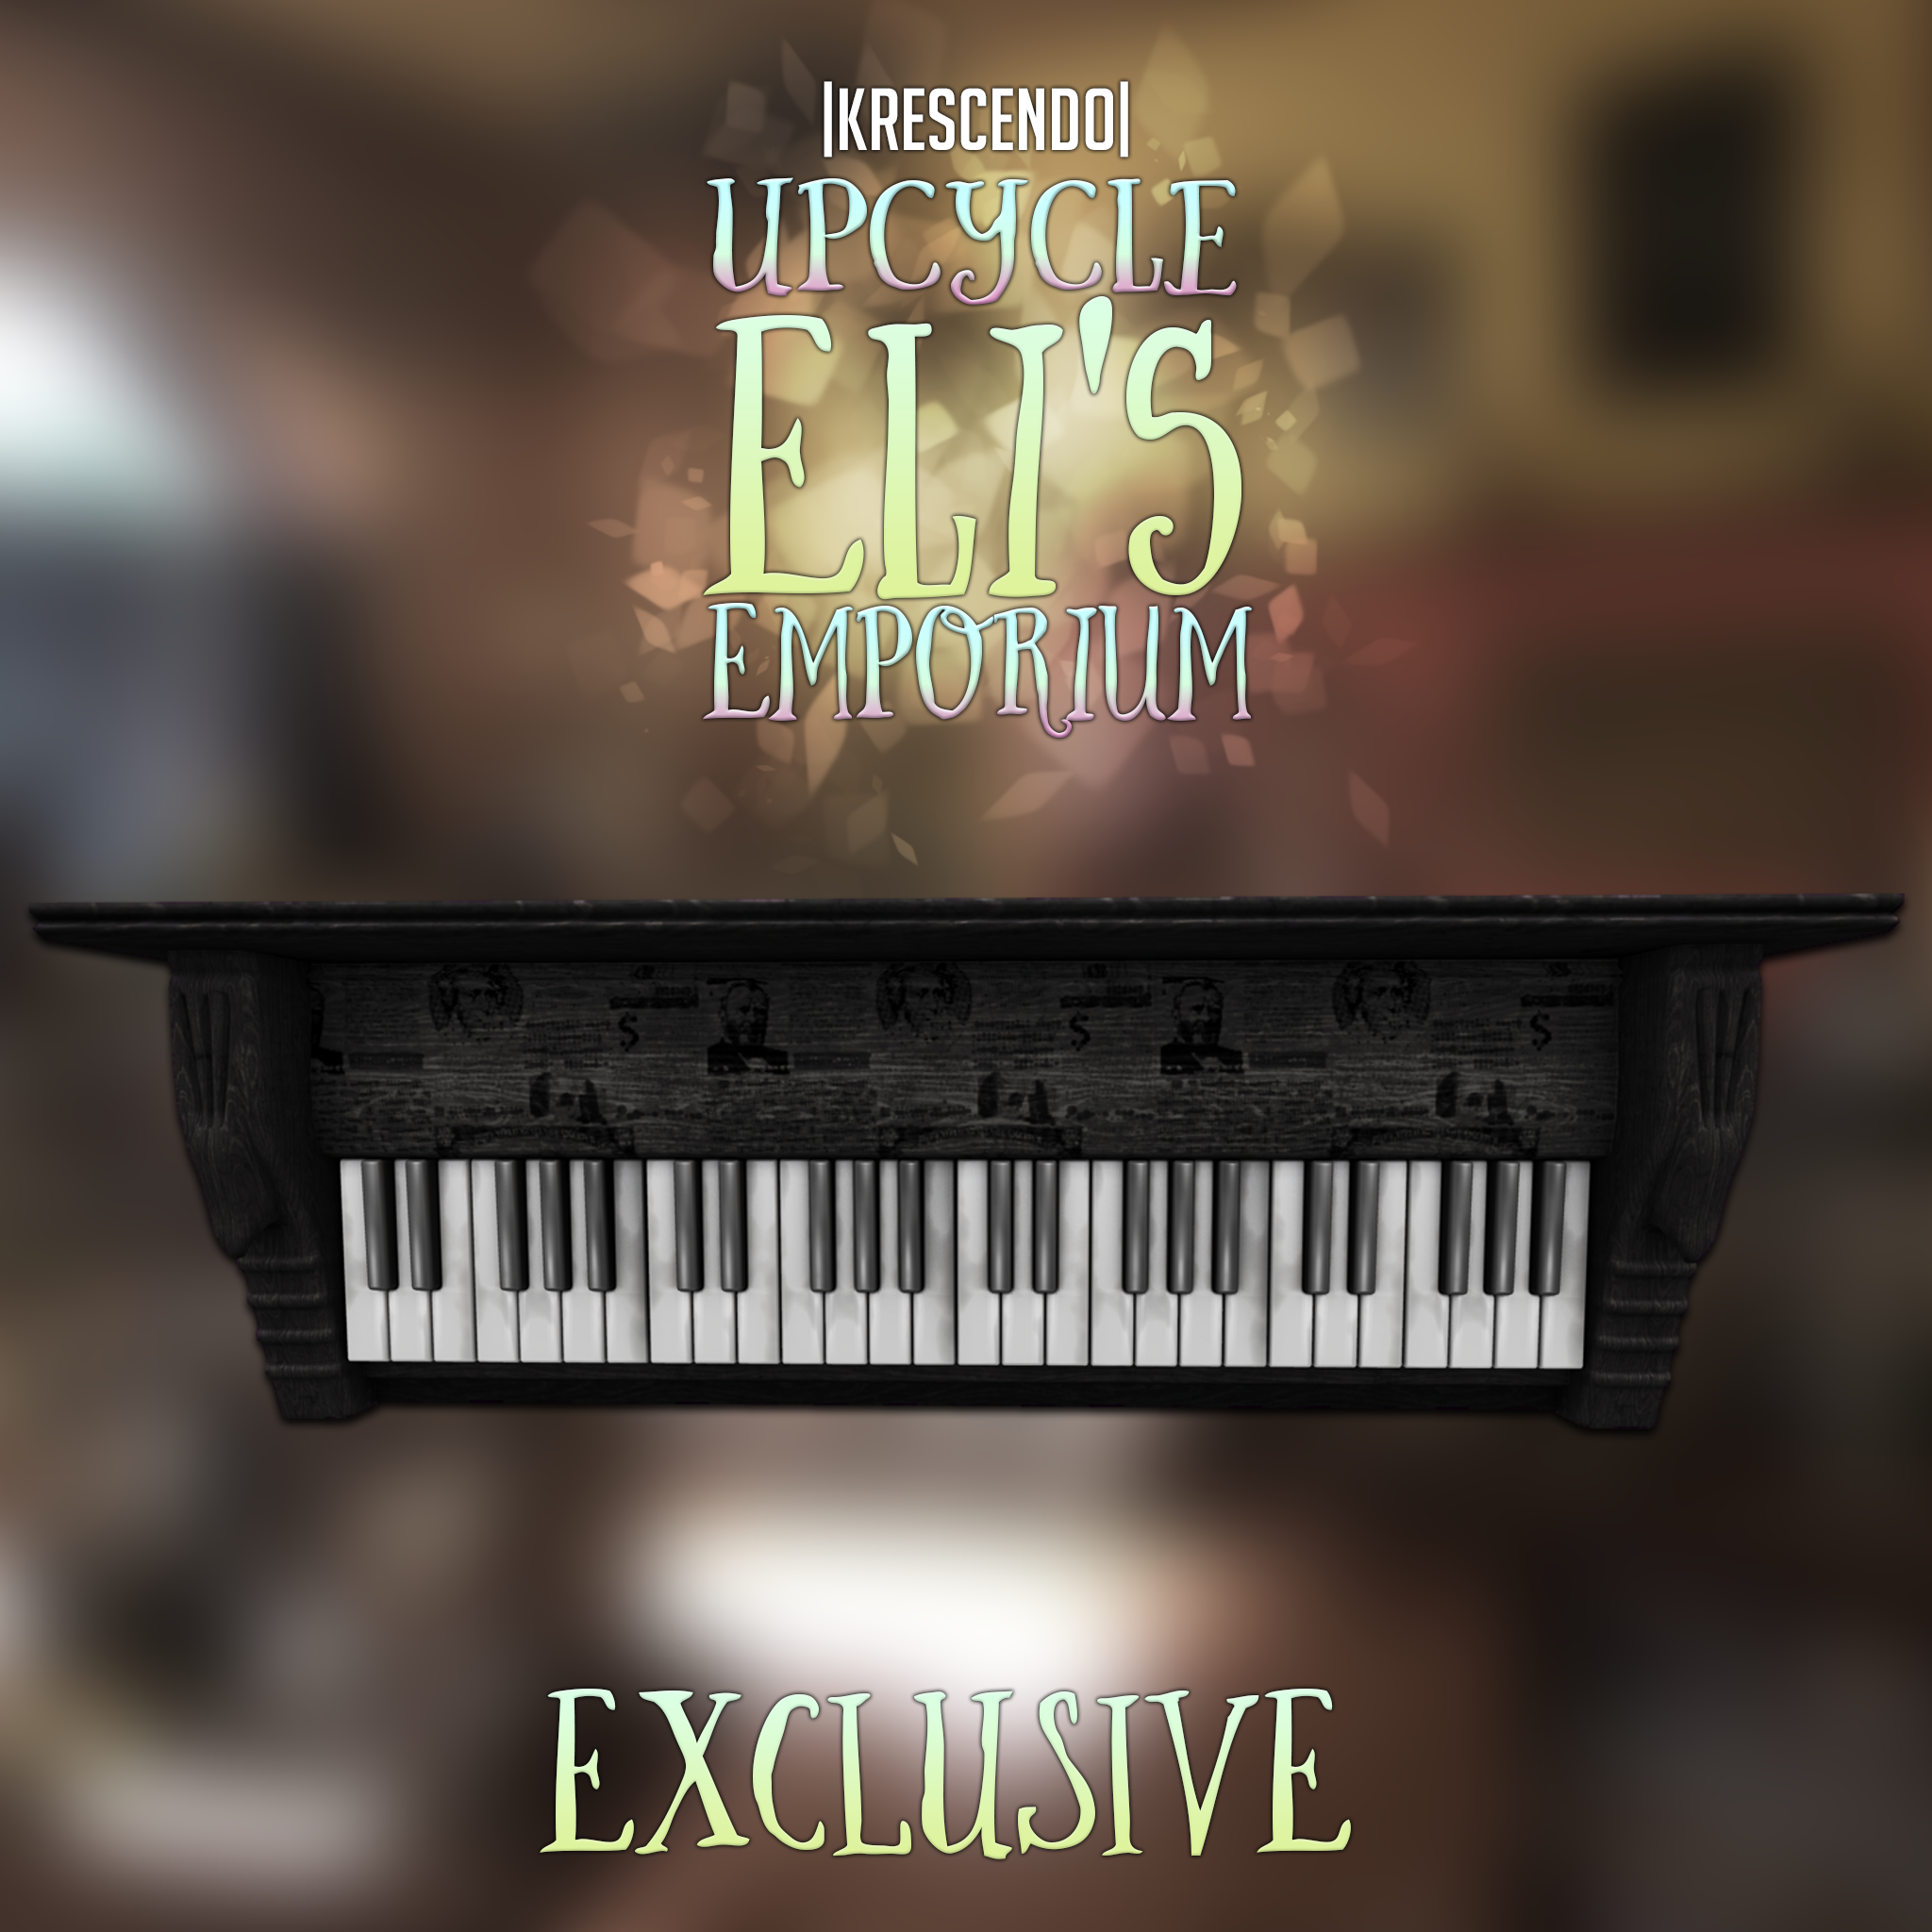 [Kres] Upcycle Eli's Emporium - Exclusive.png